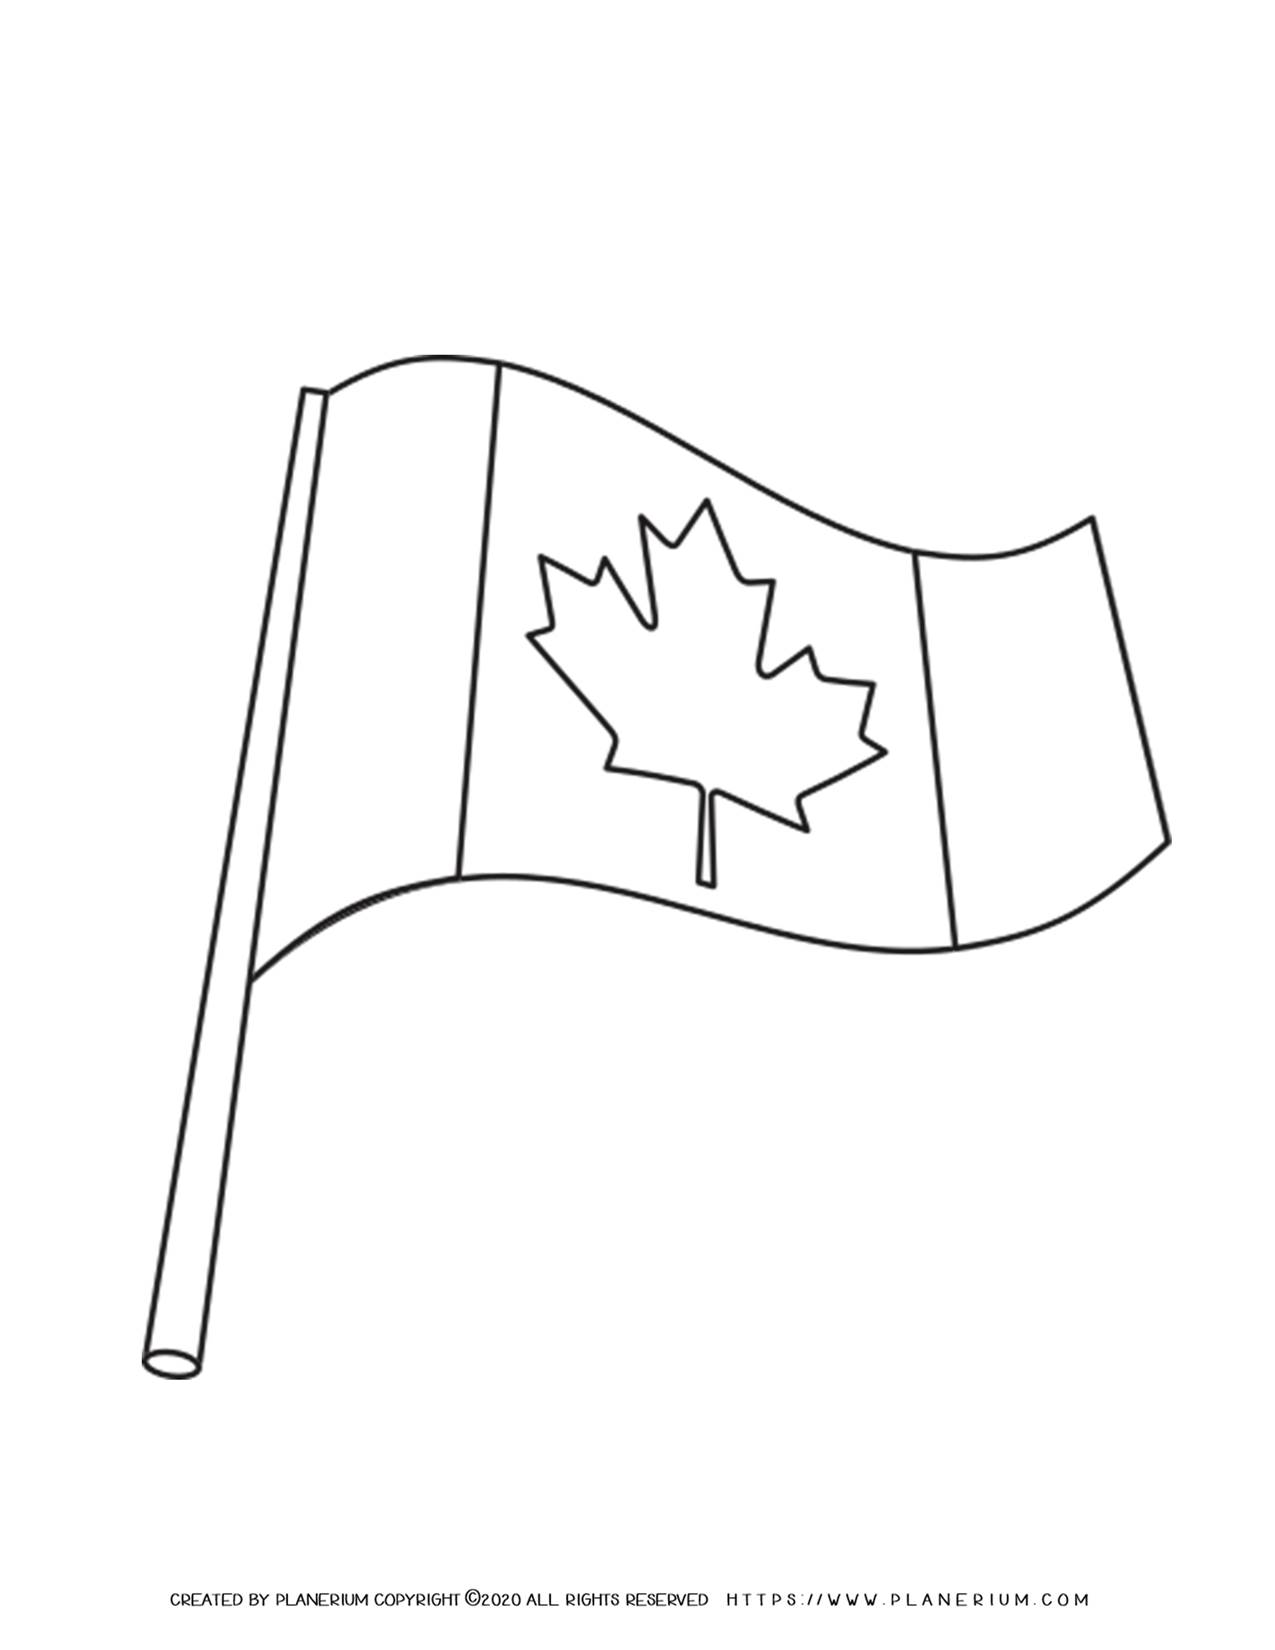 Canada Flag - Coloring Page | Planerium